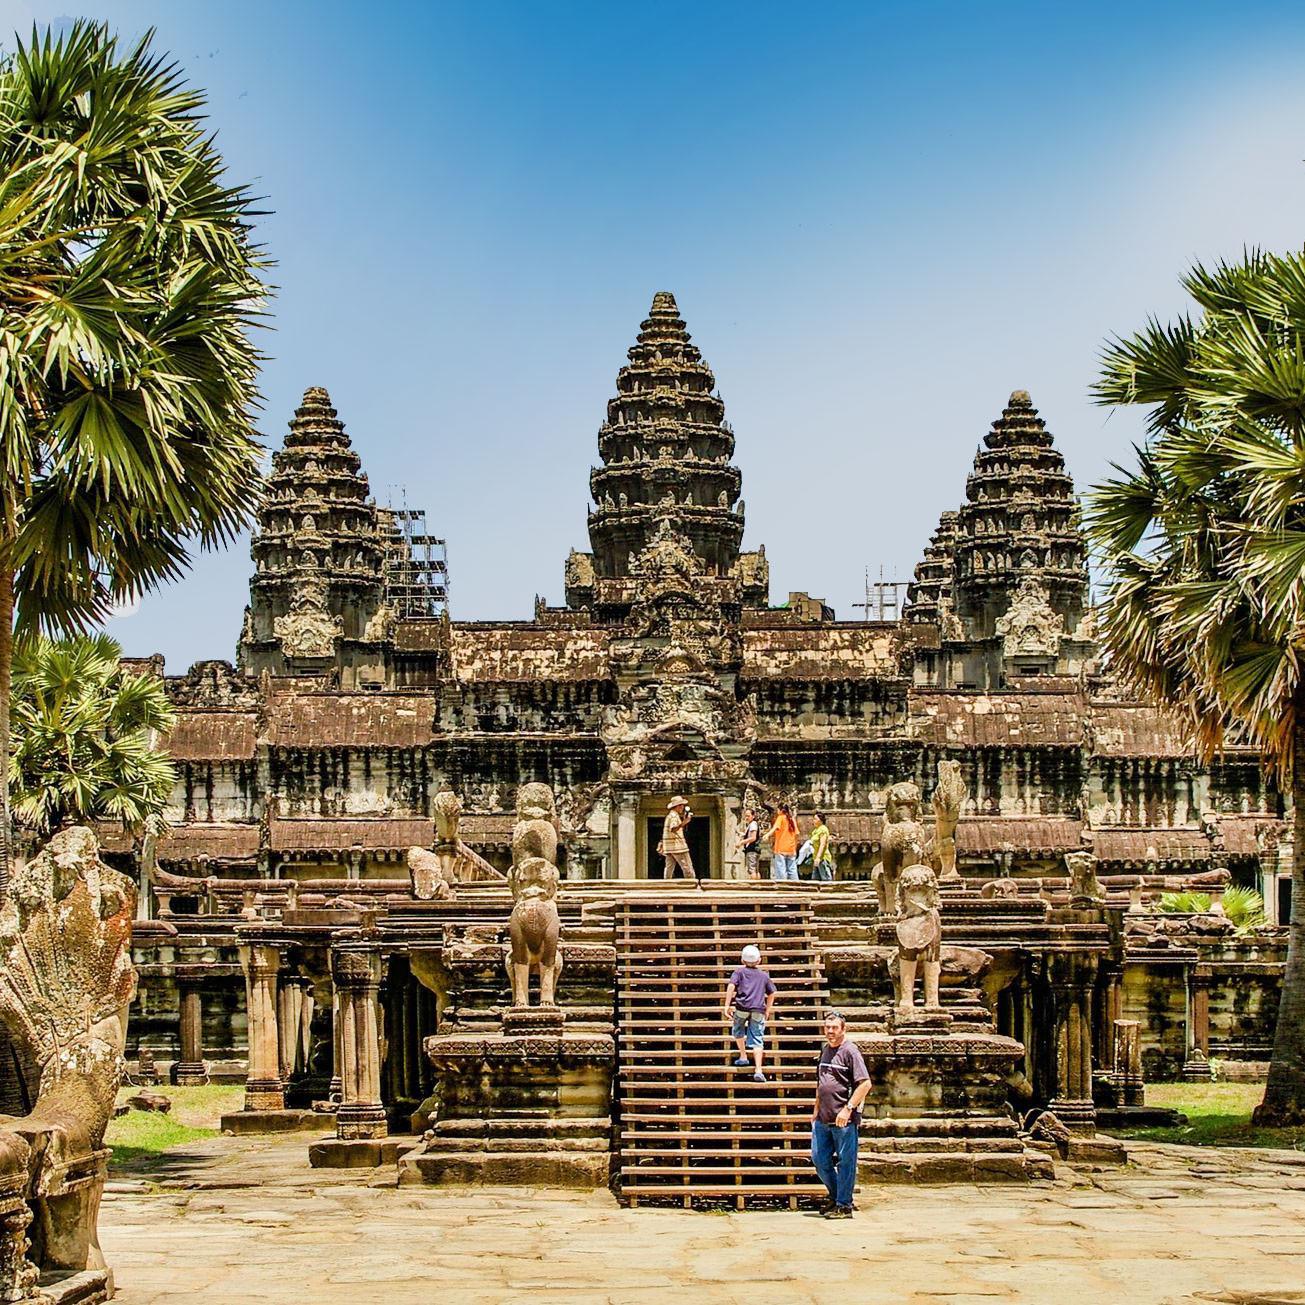 Angkor Wat cambodia Asia travel guide